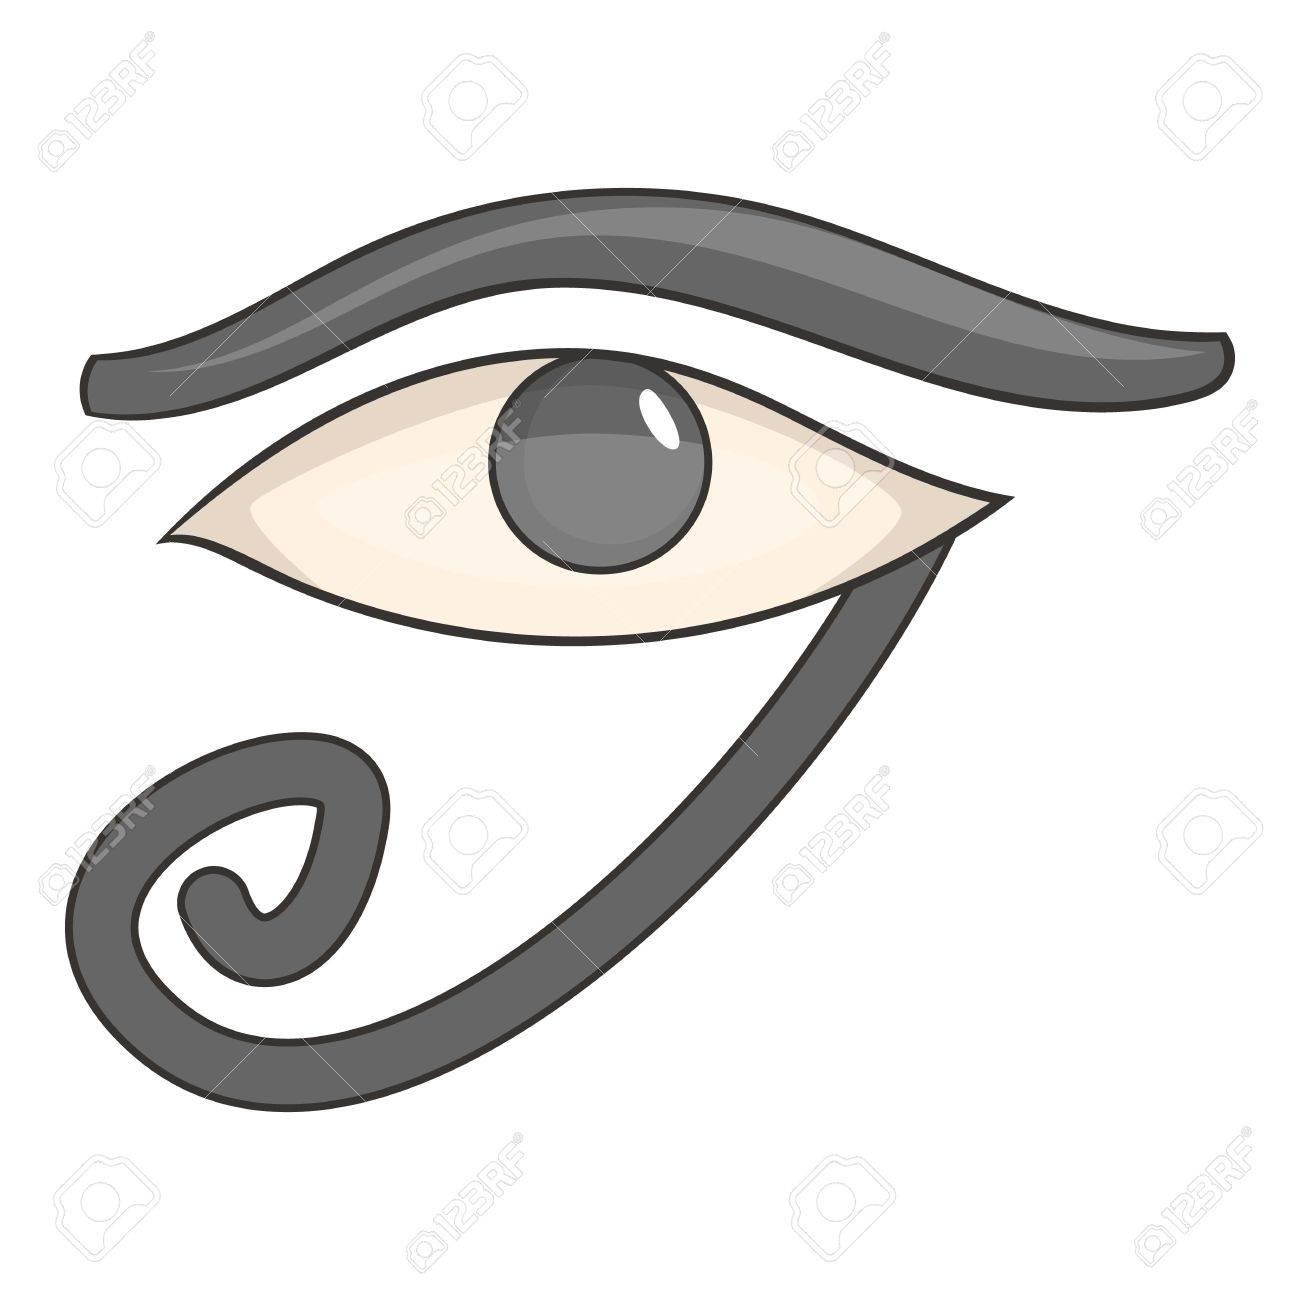 Egypt god ra symbol icon cartoon illustration of ra symbol vector egypt god ra symbol icon cartoon illustration of ra symbol vector icon for web design biocorpaavc Gallery